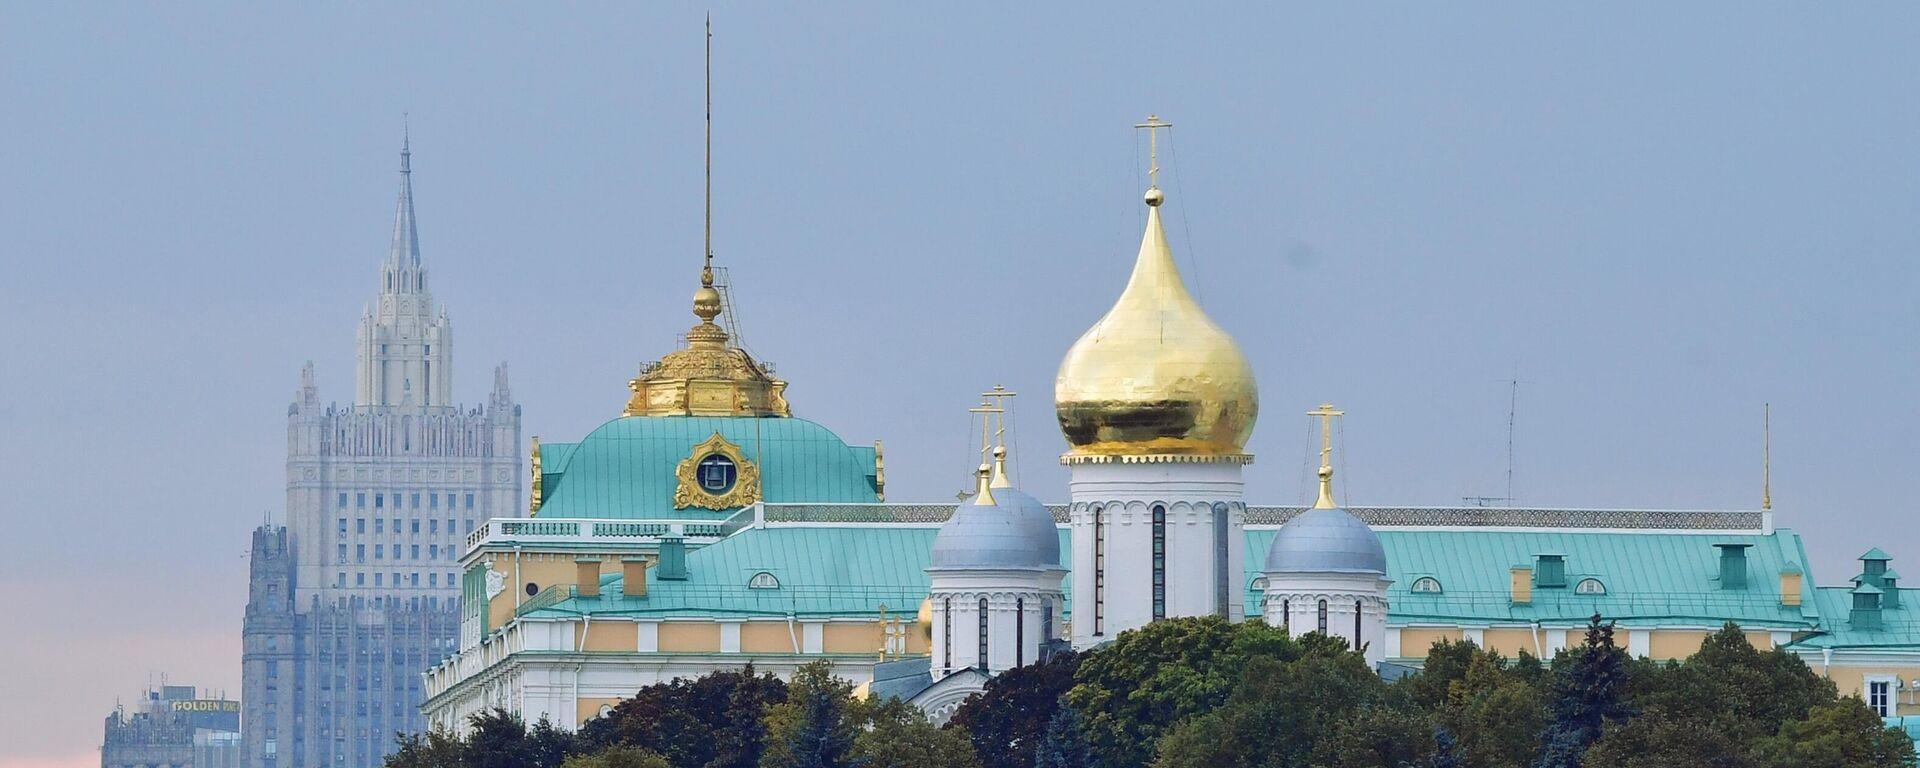 Виды Москвы - Sputnik Таджикистан, 1920, 12.10.2021